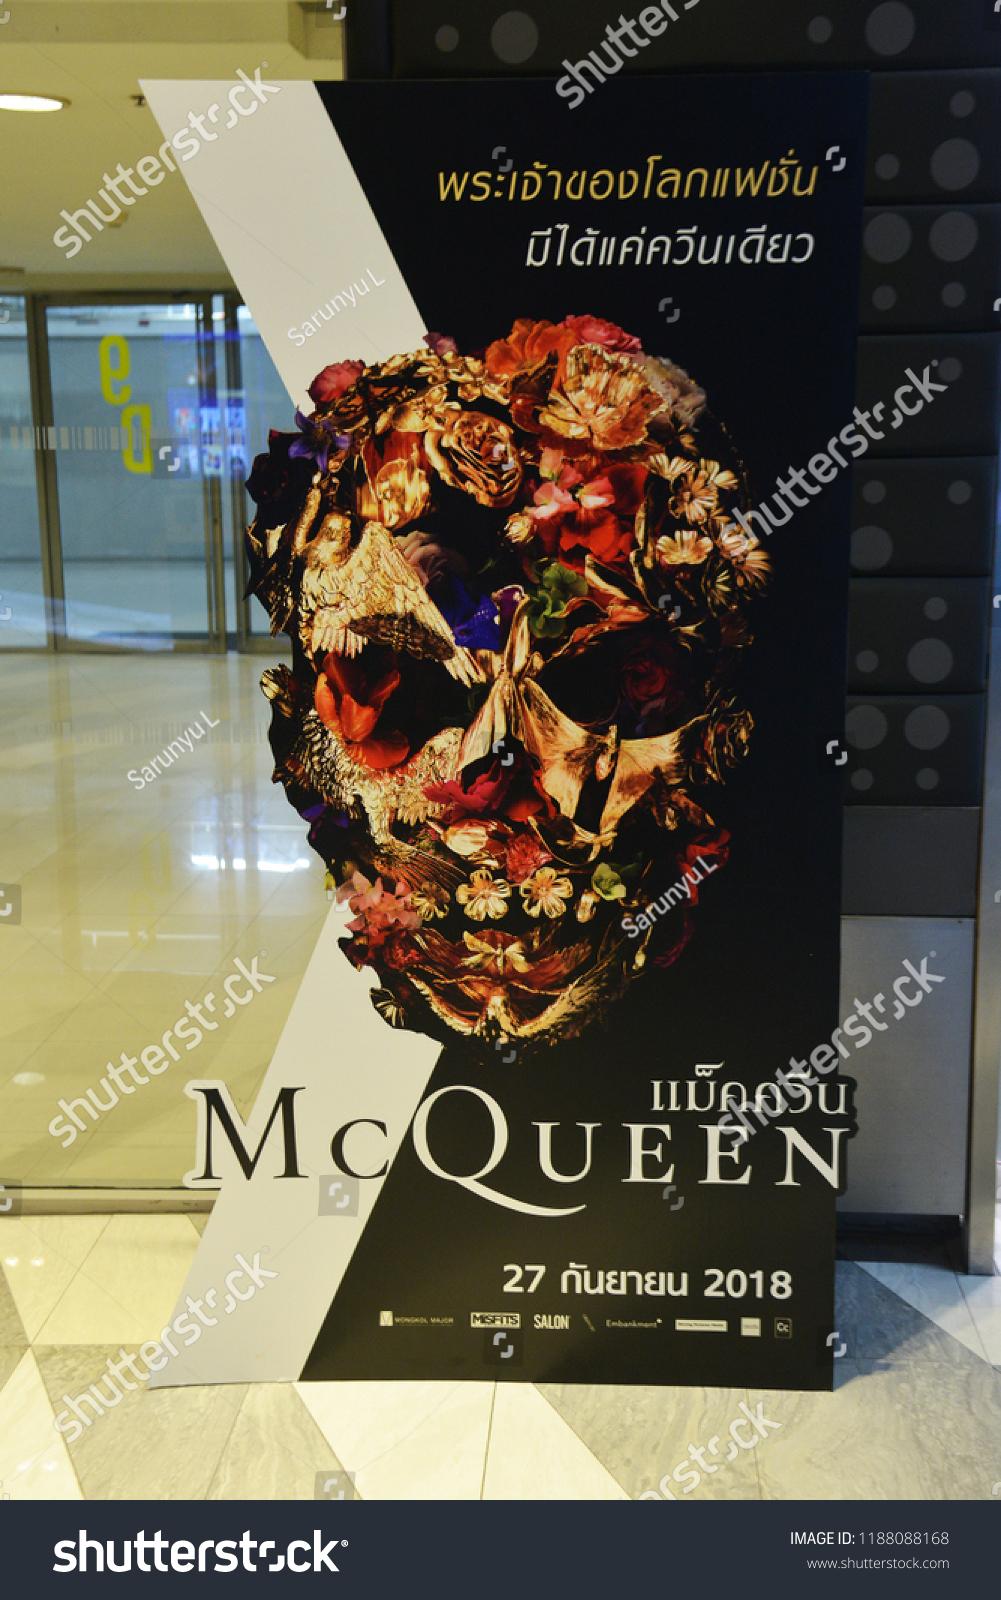 Bangkok Thailand September 16 2018 Standee The Arts Stock Image 1188088168